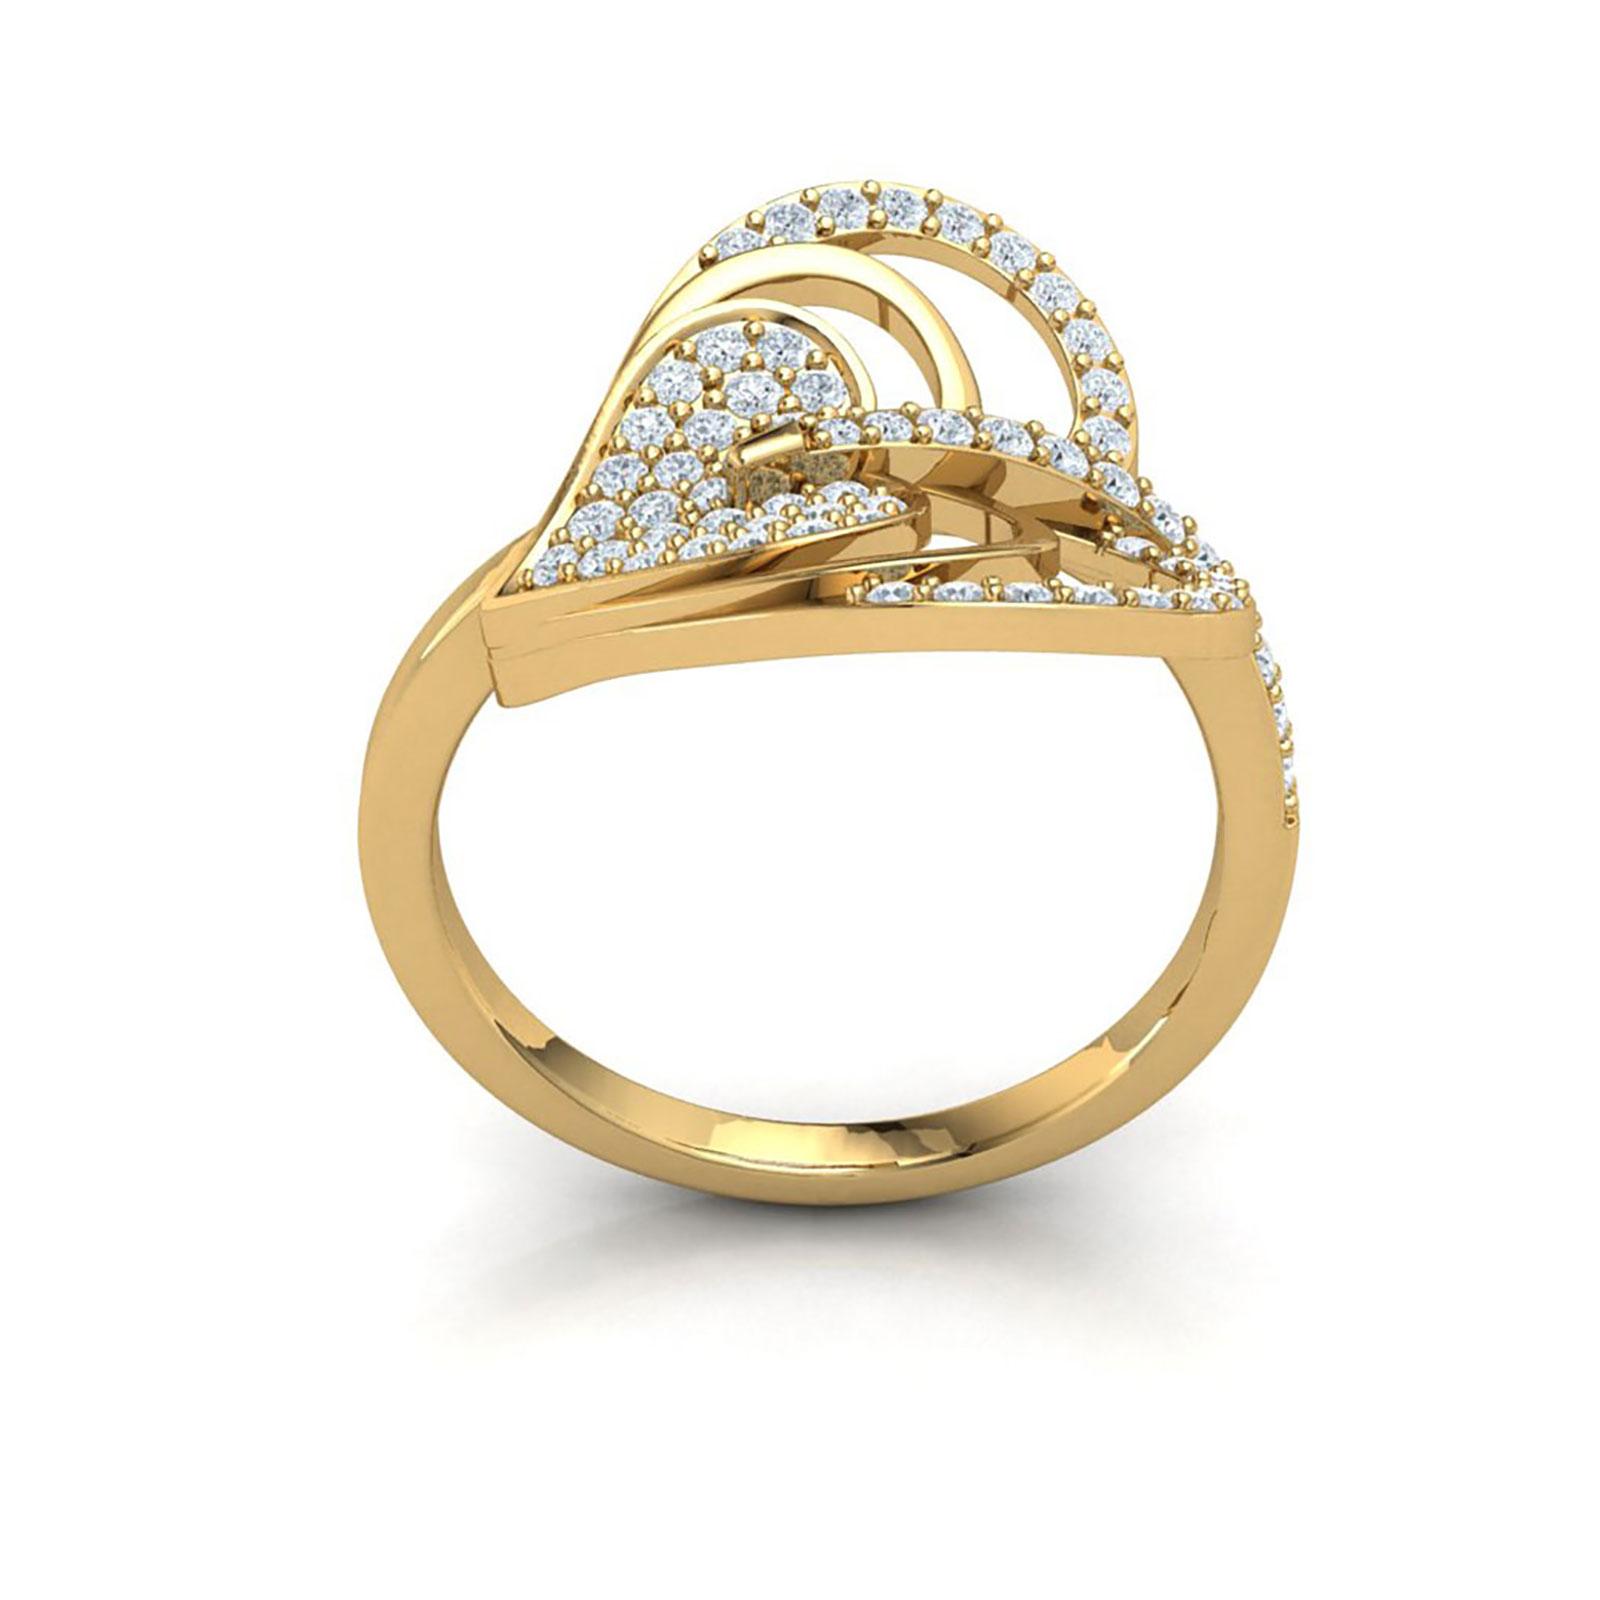 Genuine 1ctw Round Cut Diamond Prong Modern Heart Bridal Fancy Ring